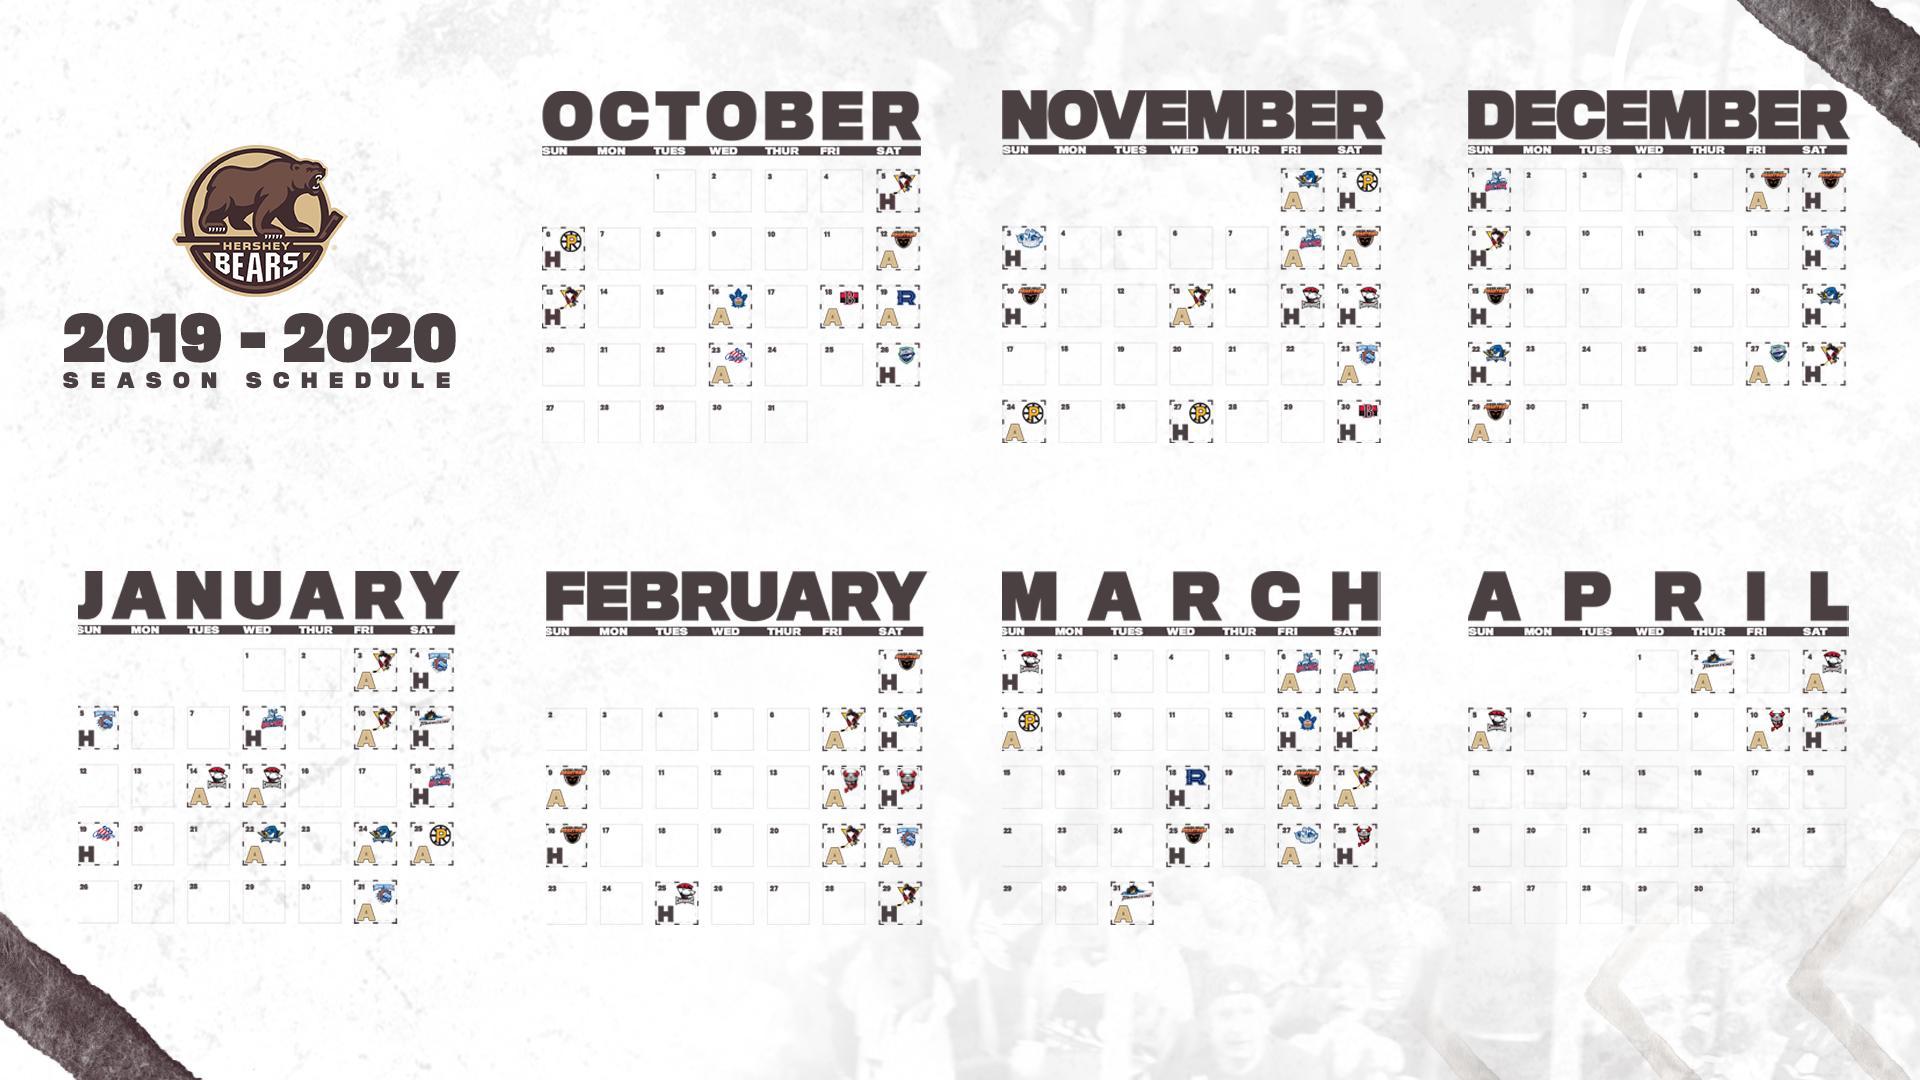 Bears Preseason Schedule 2020 Hershey Bears release 2019 20 regular season schedule